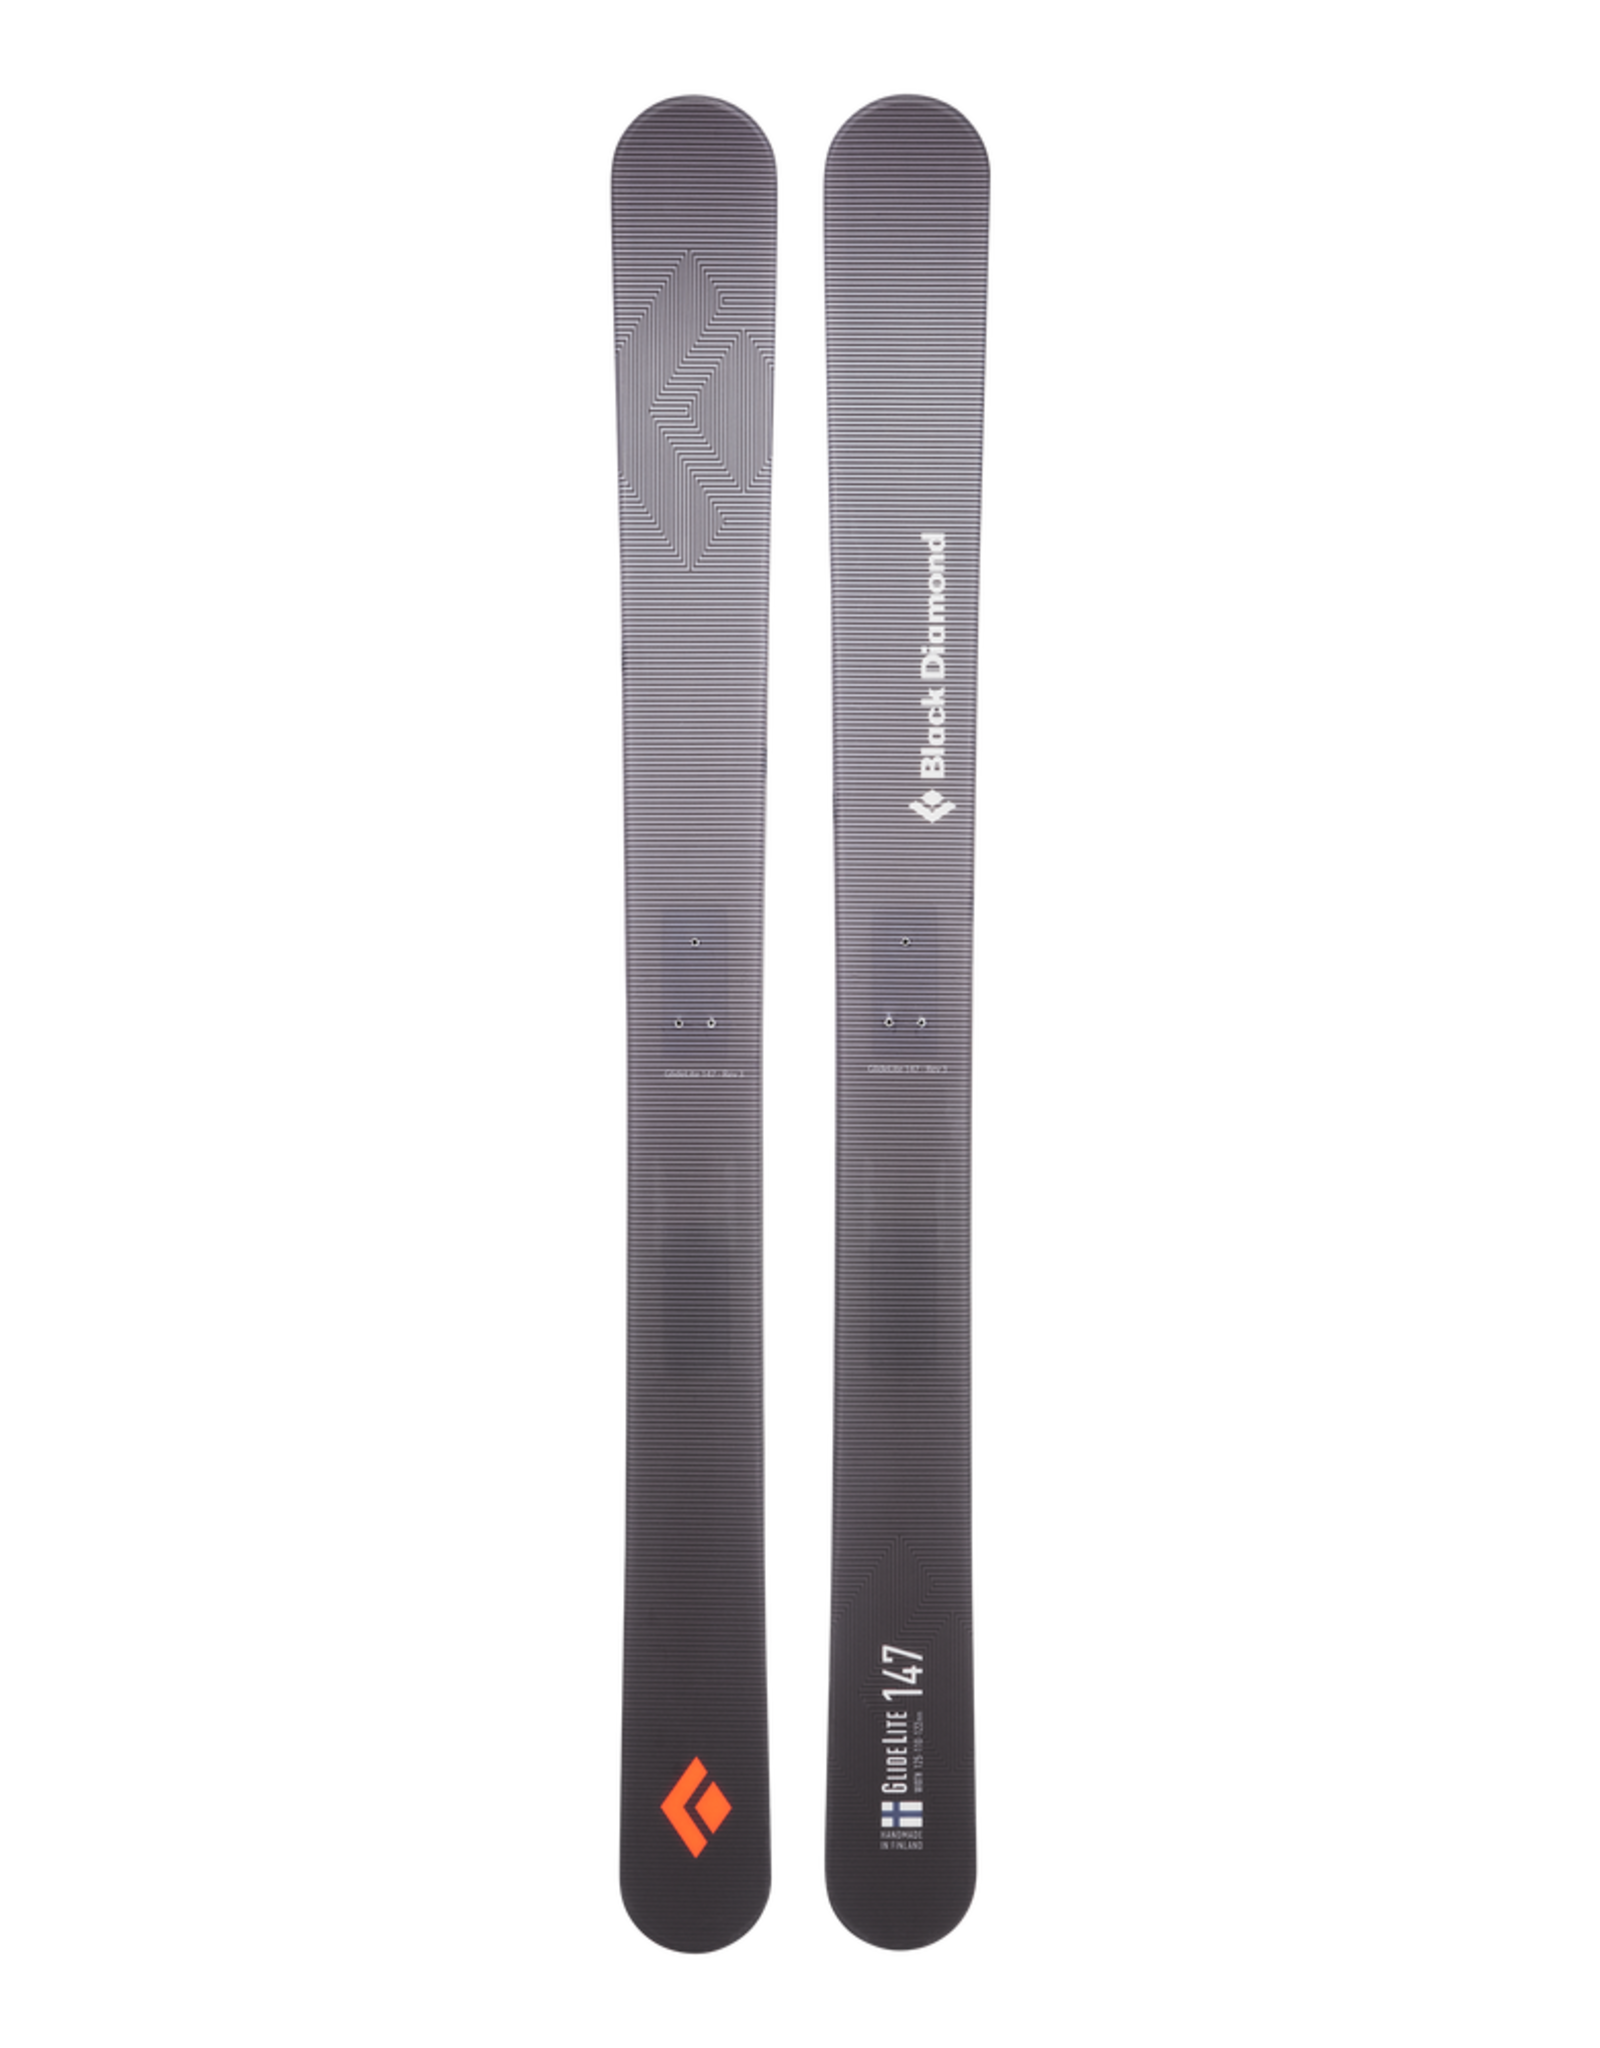 Black Diamond Black Diamond 2022 GlideLite 147 Trek Skis Flat (w/o Bindings)